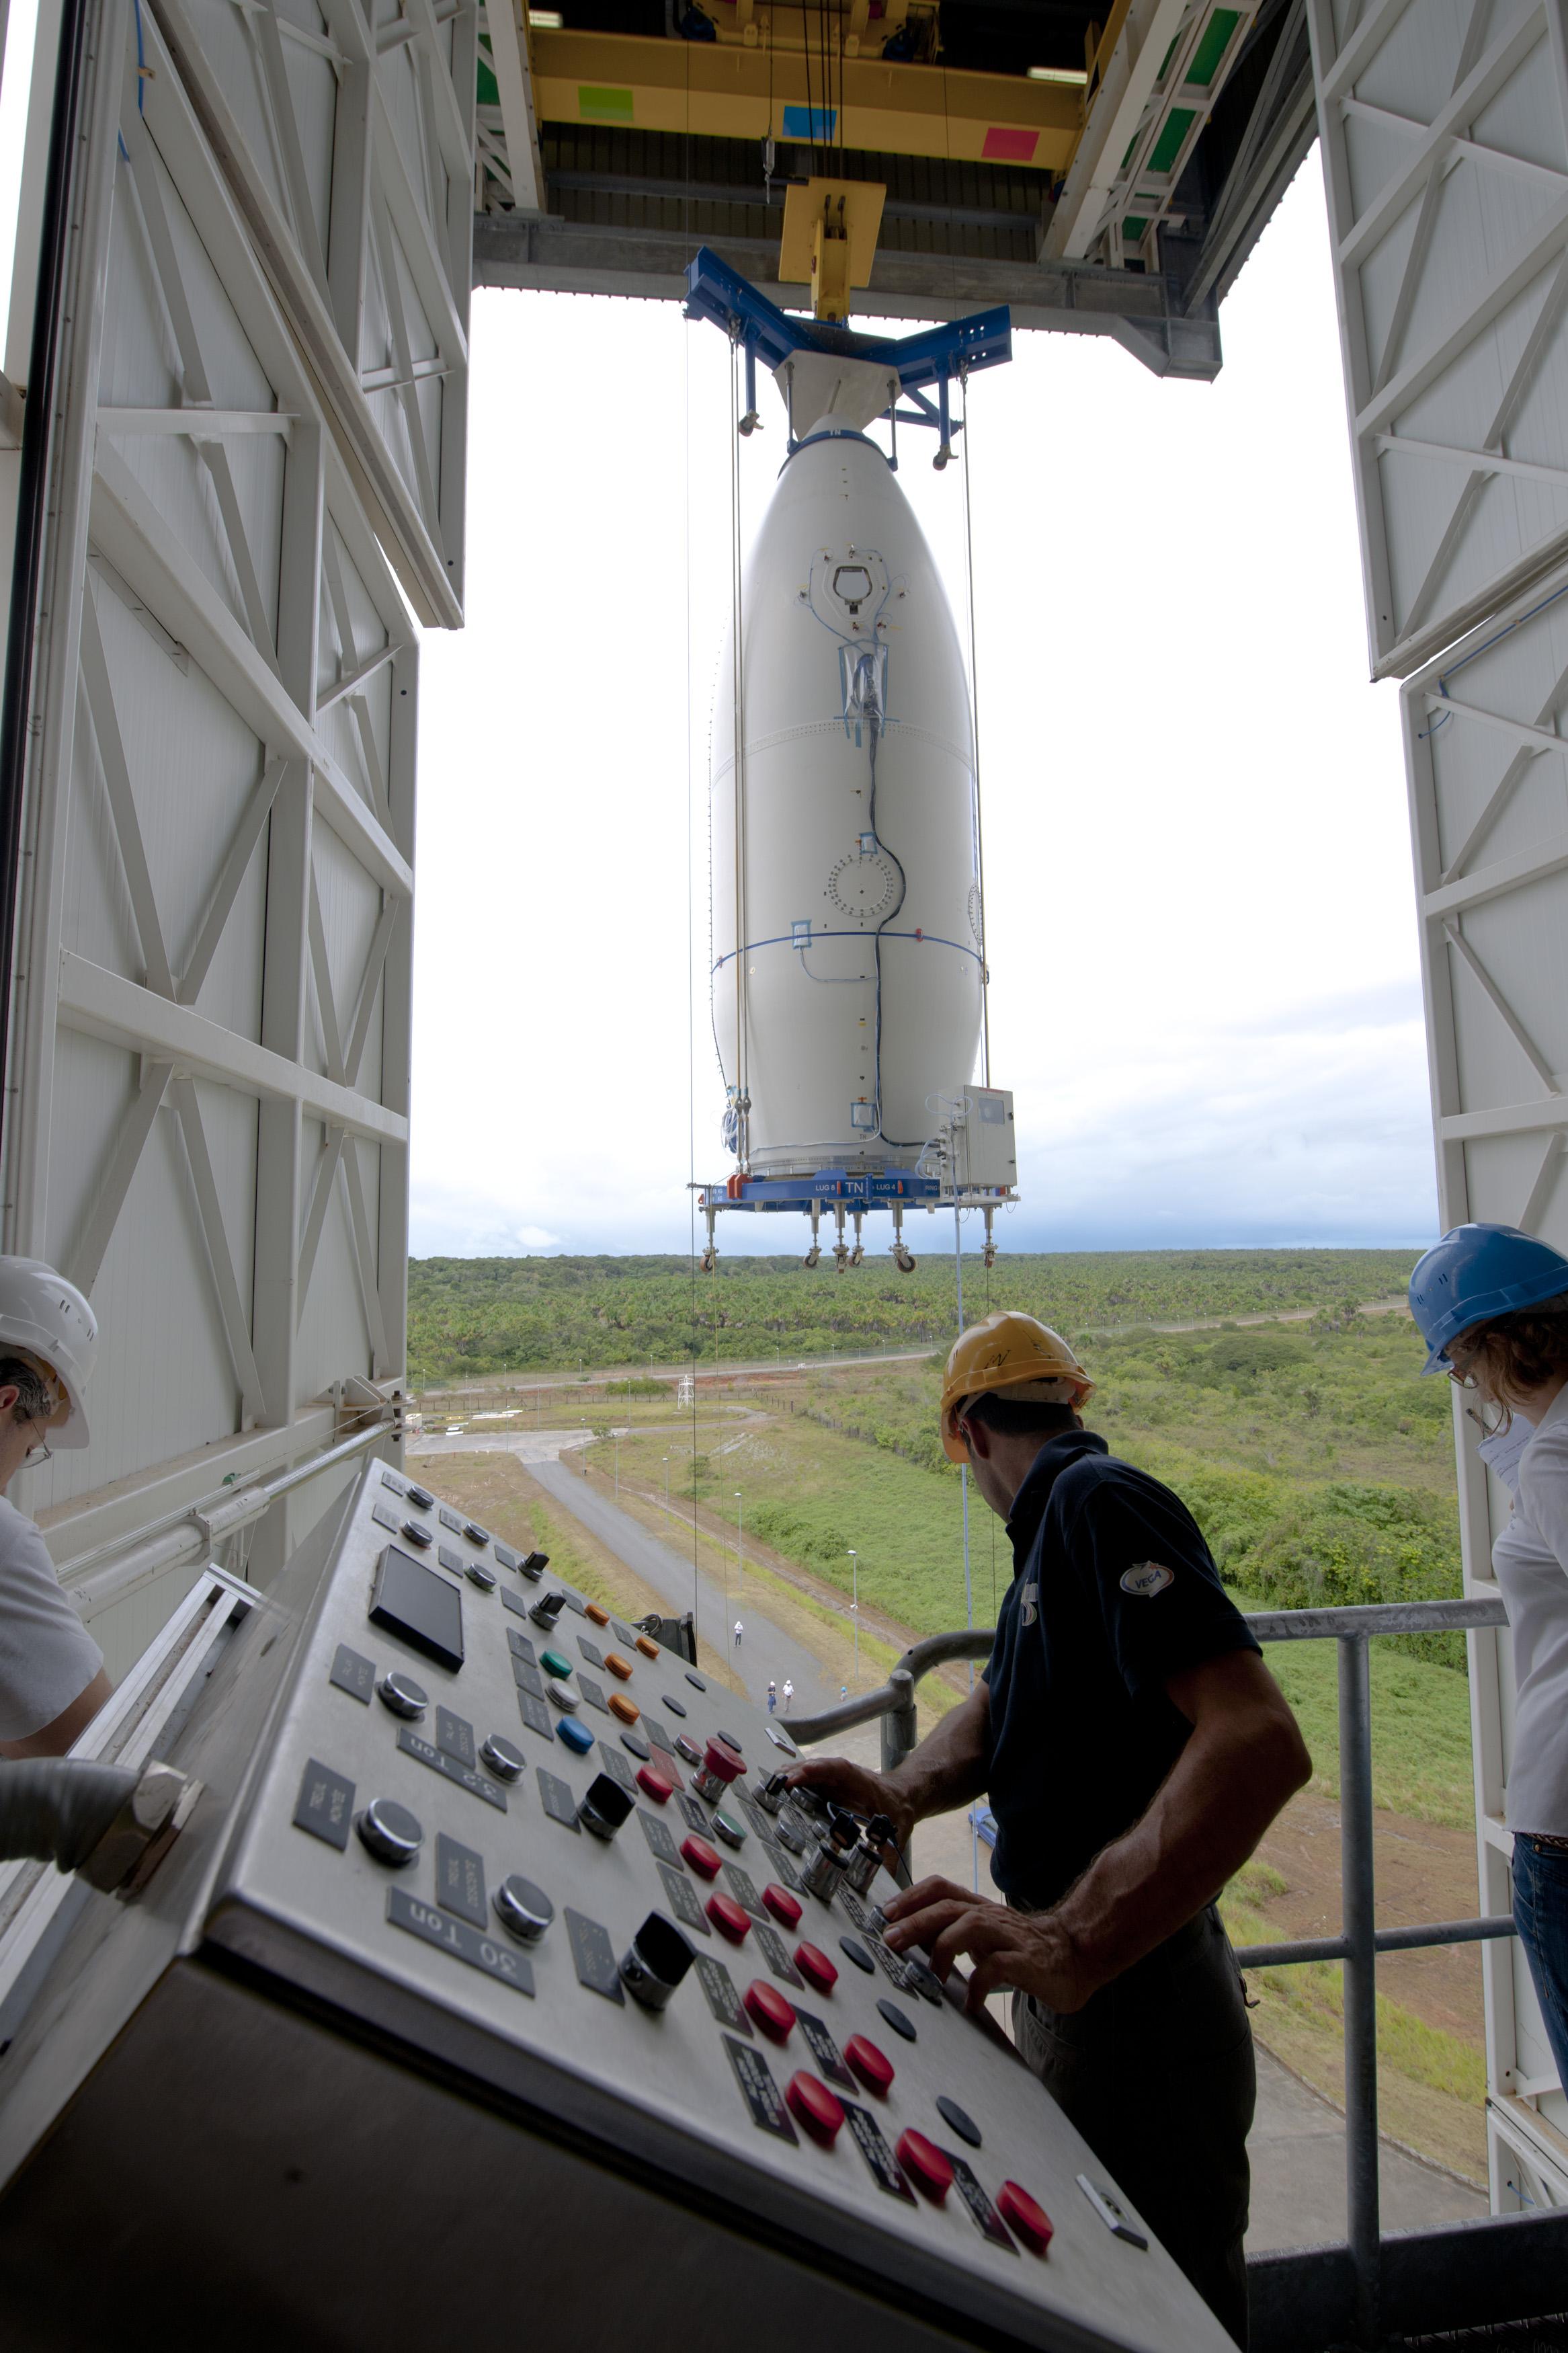 Hoisting of Vega's payload composite